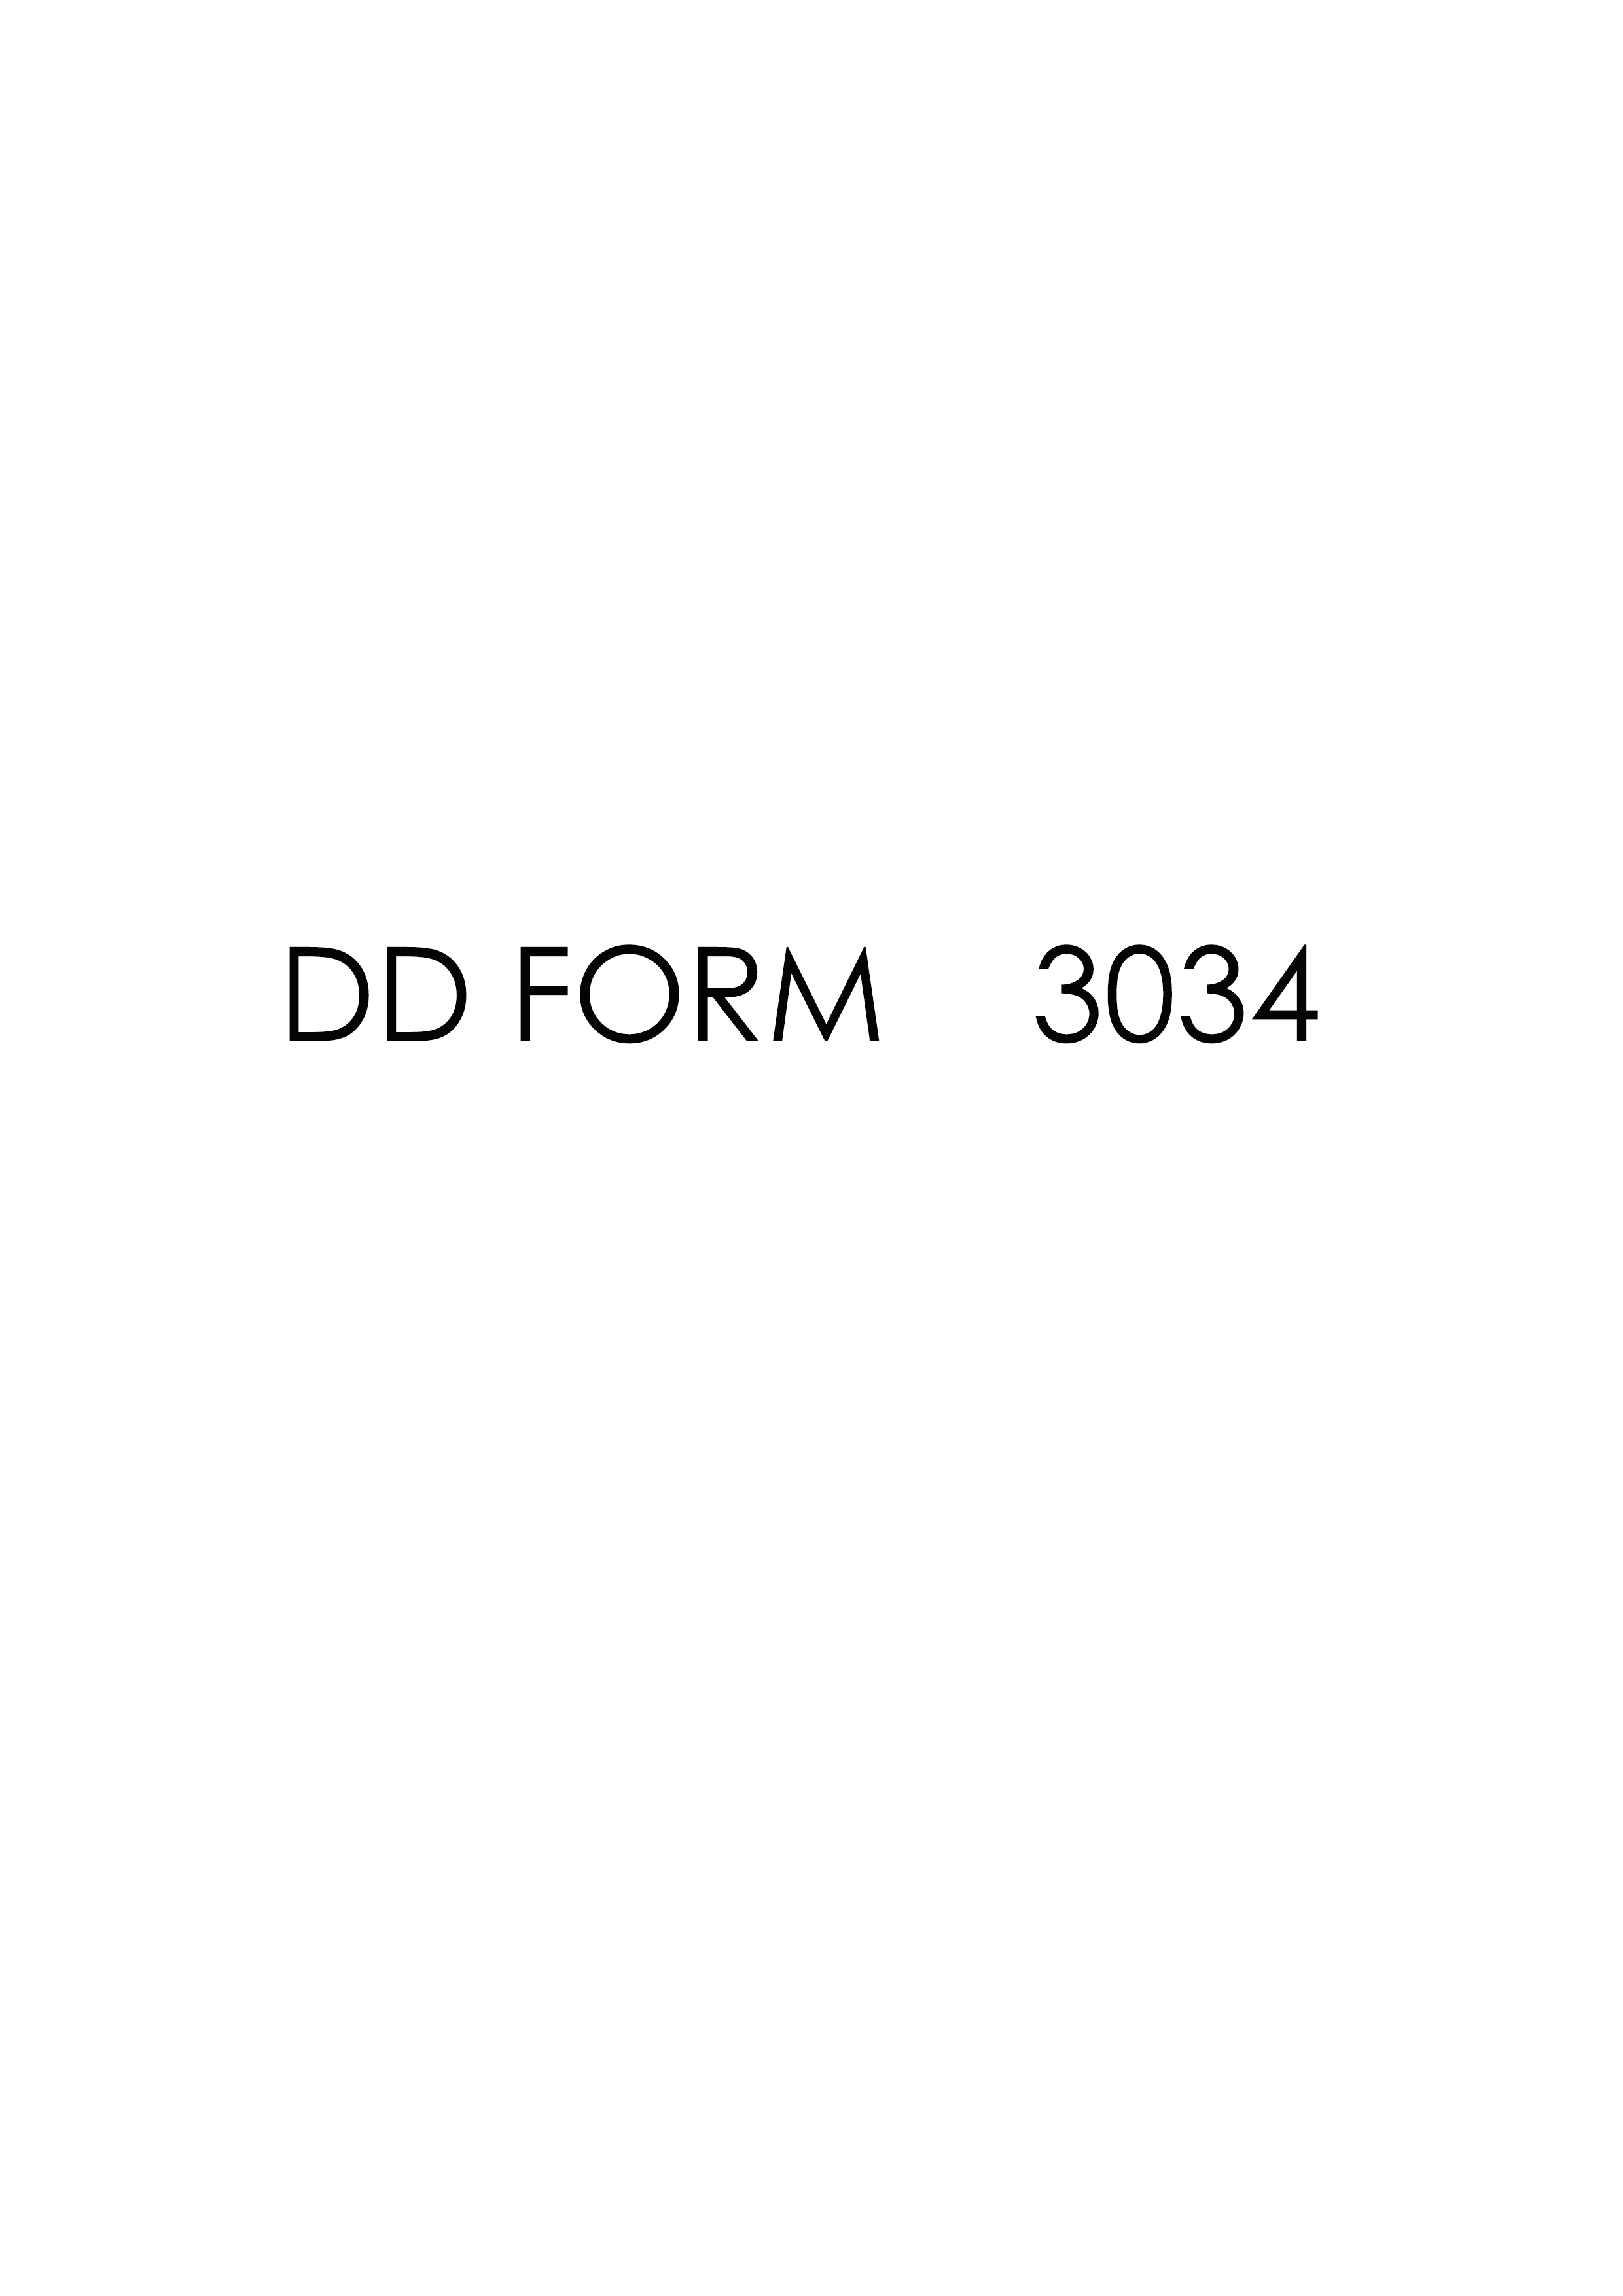 Download dd Form 3034 Free